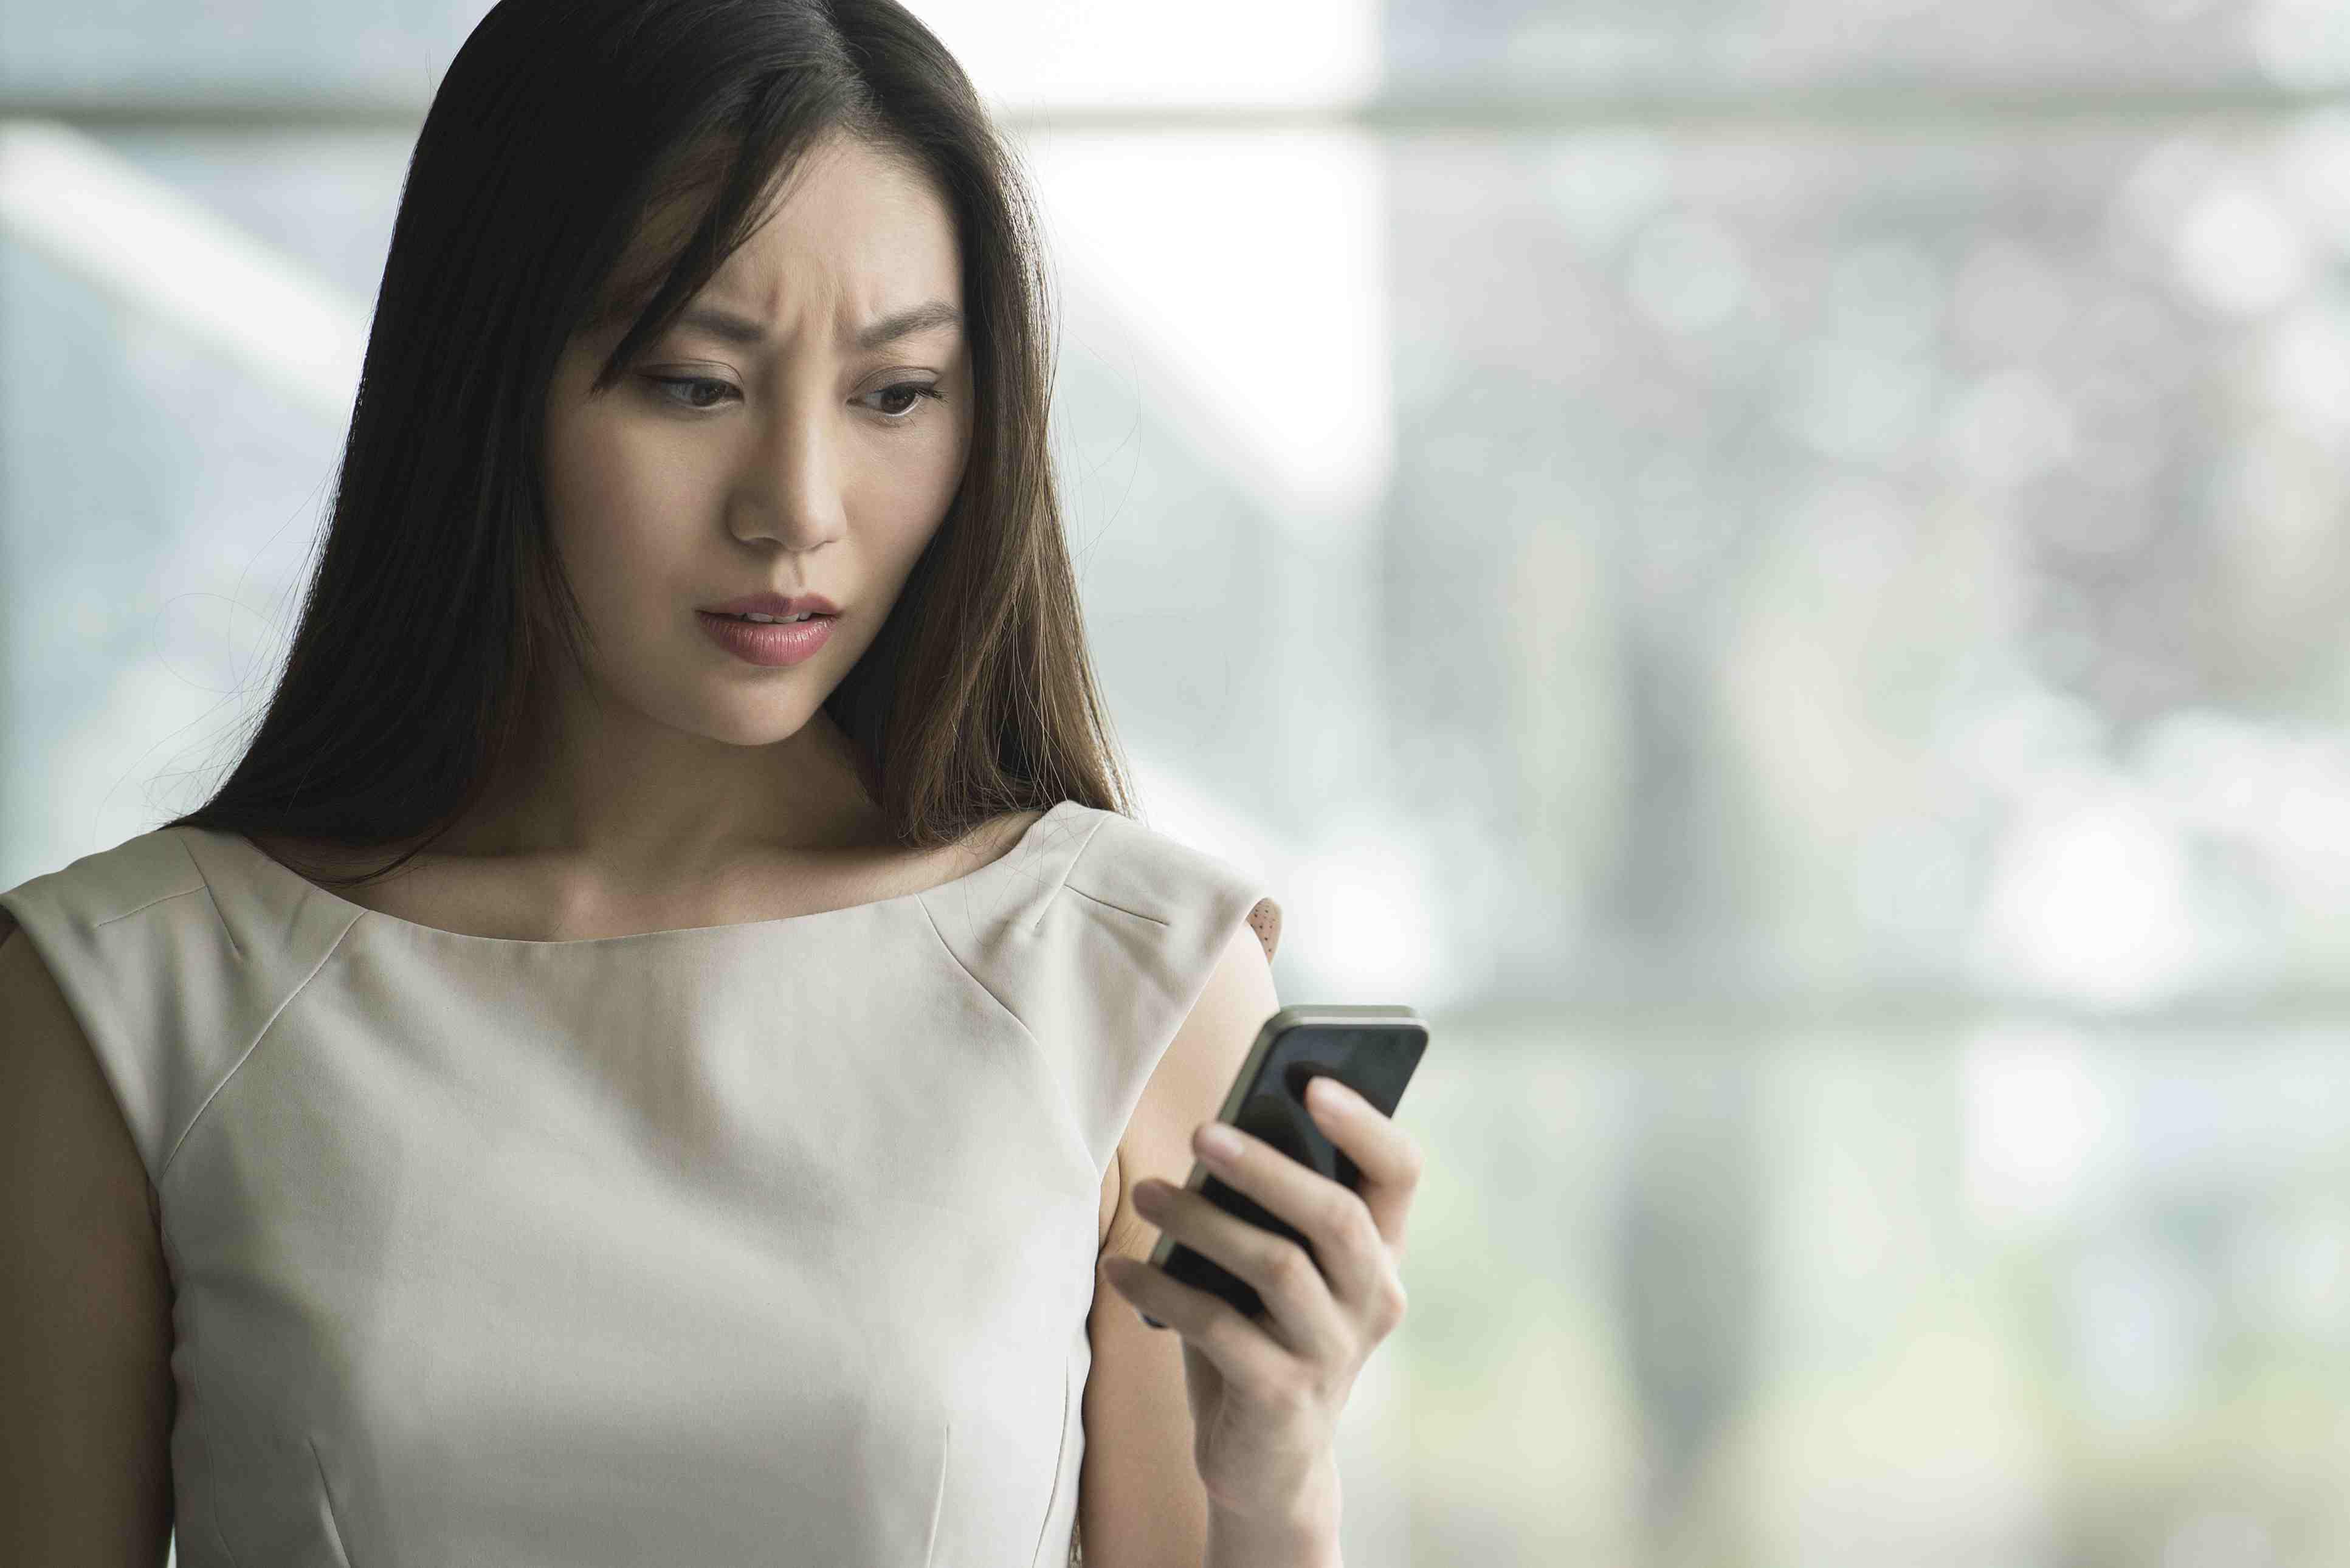 Woman receiving bad news on smartphone